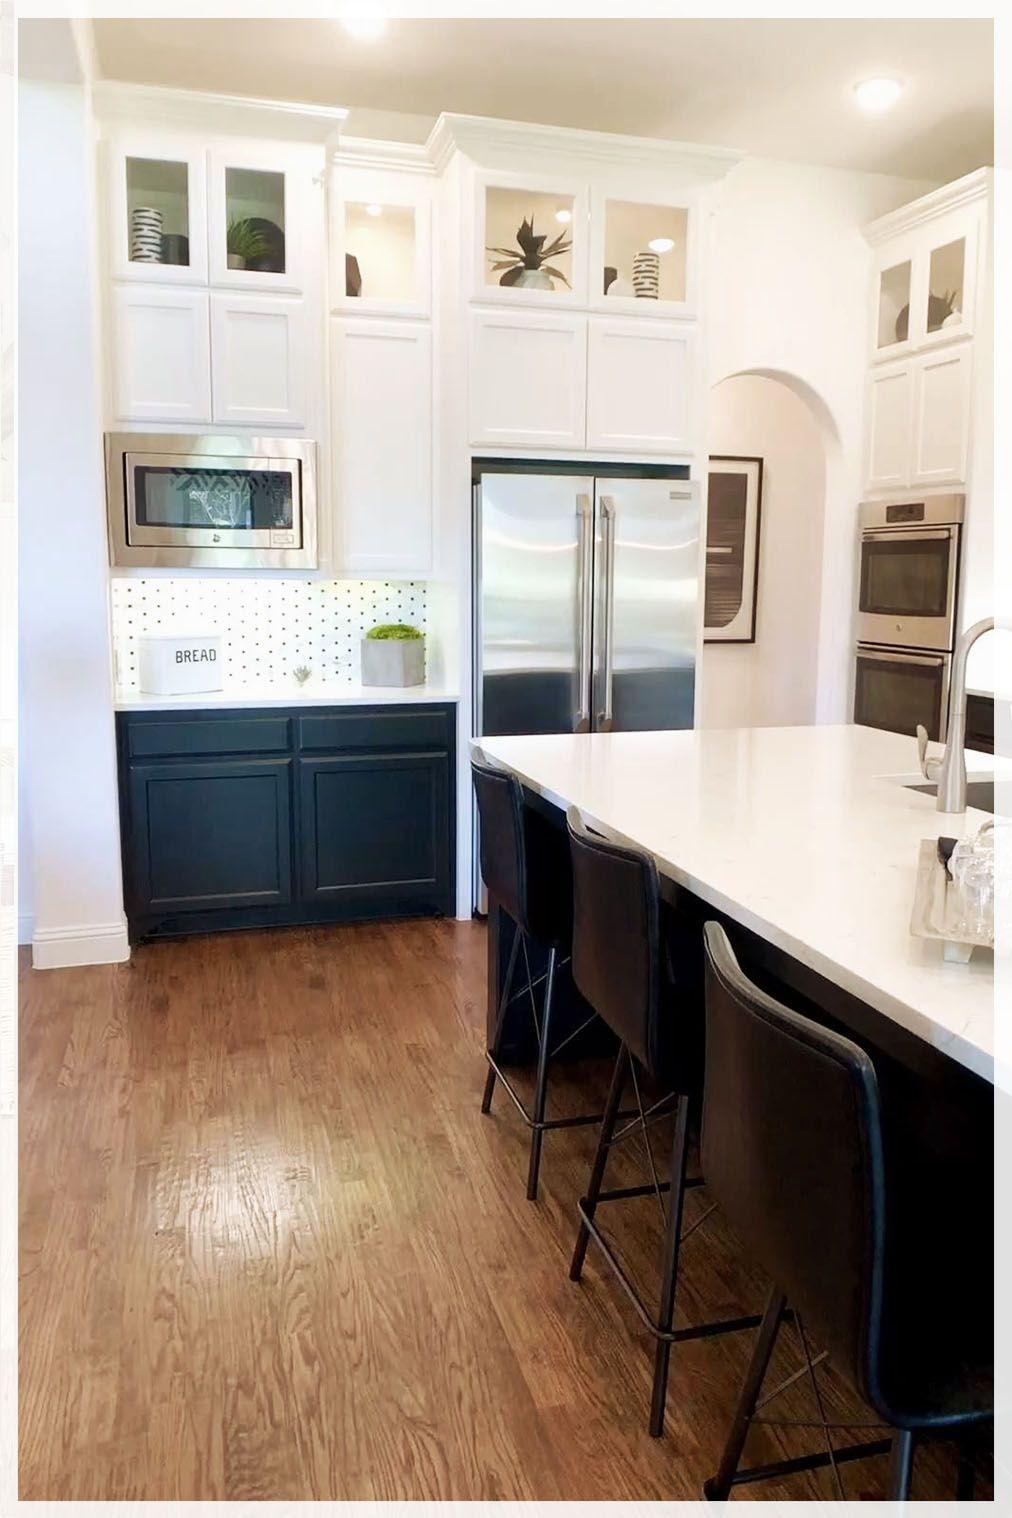 15 Cape Cod Style Kitchen Ideas To Copy Beautiful Kitchens Diy Kitchen Renovation Kitchen Diy Makeover